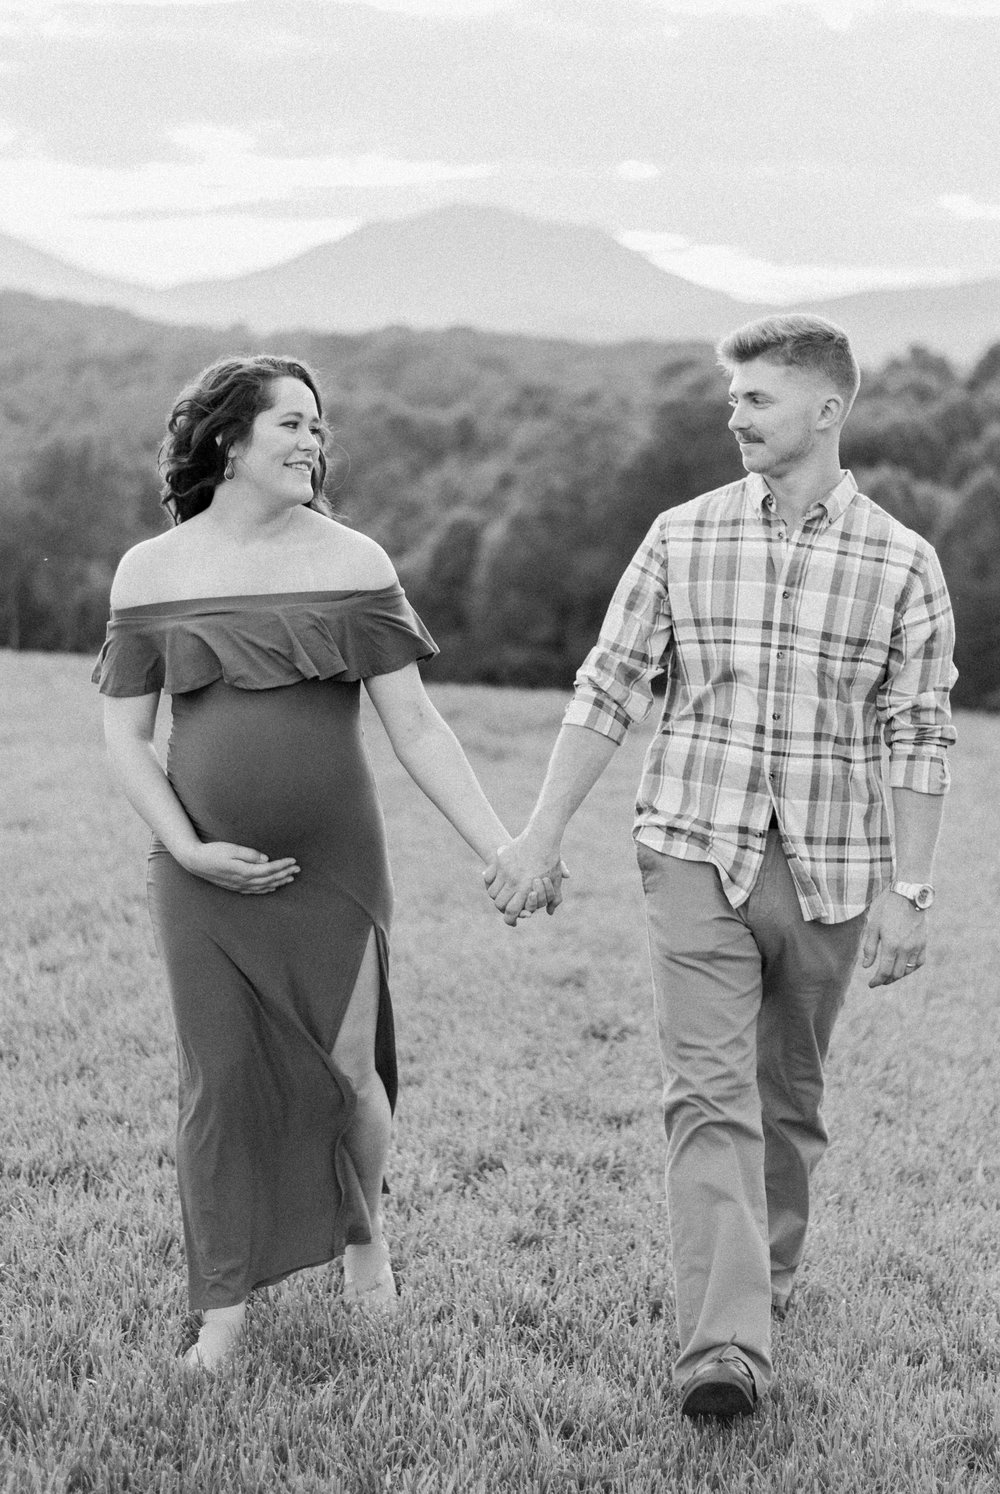 GlassHillVenue_ForestVA_LynchburgVA_CentralVirginiaphotographer_LynchburgPhotographer_MaternityPhotographer 42.jpg